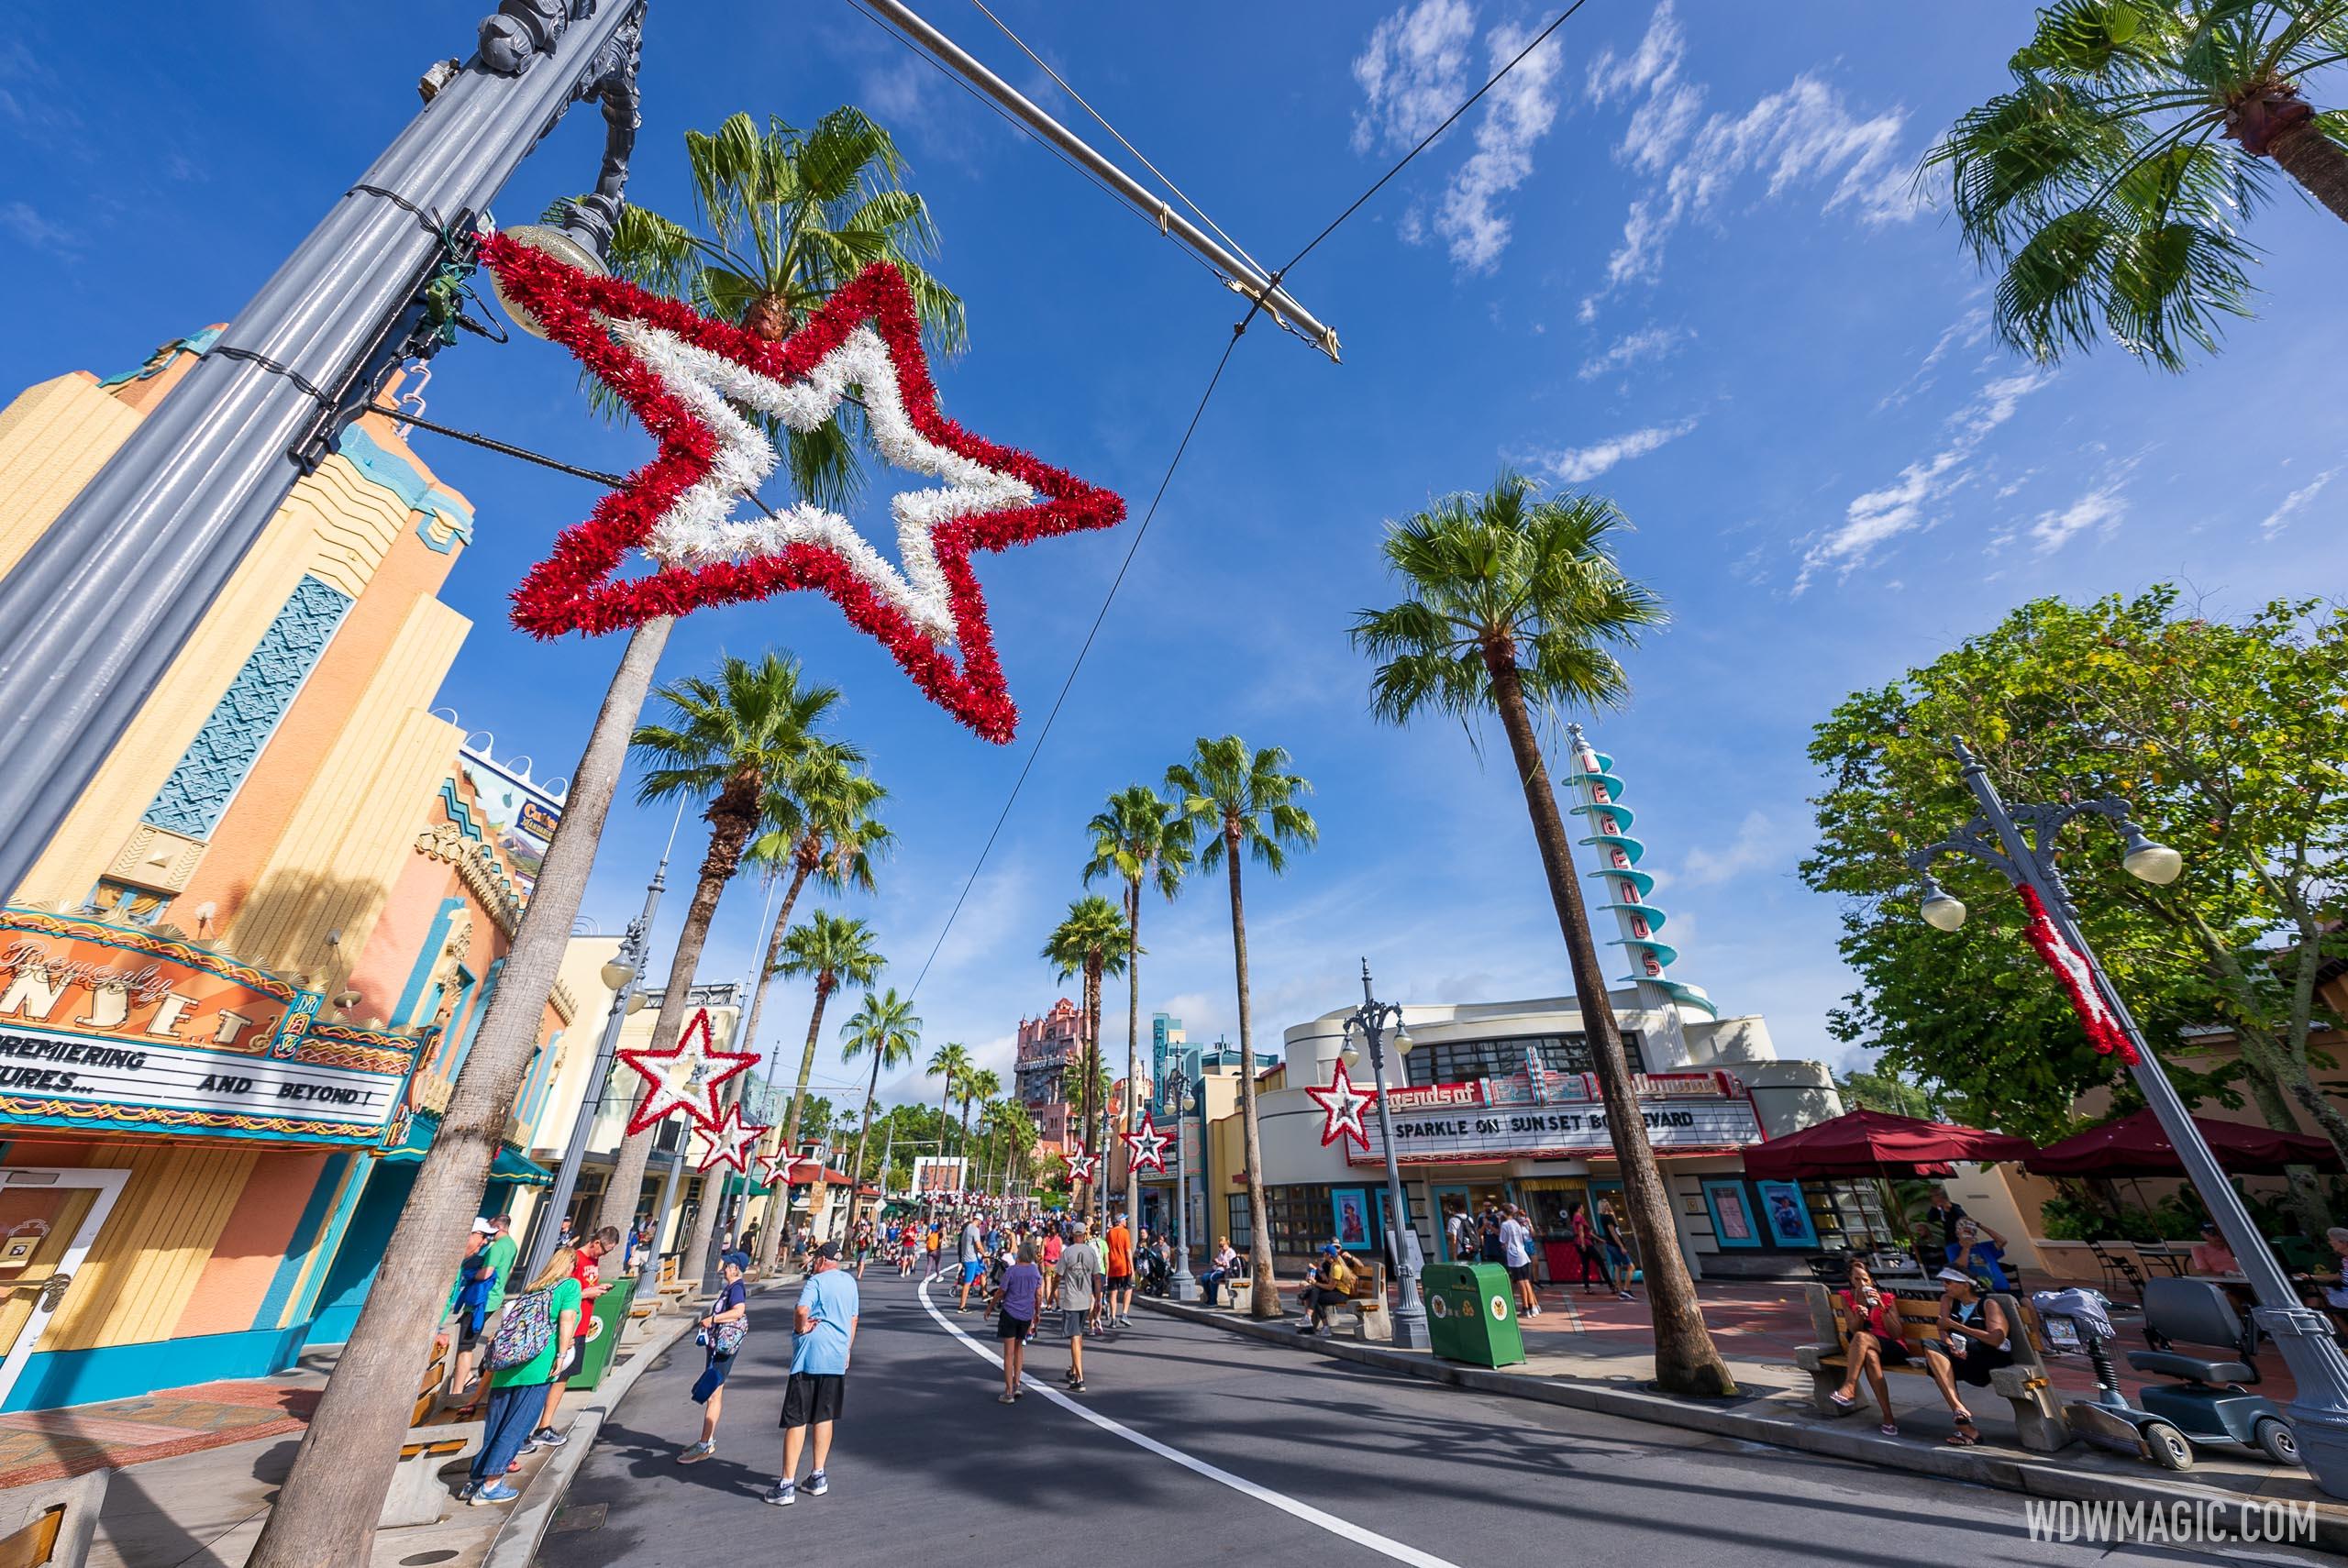 Holiday decor arrives at Walt Disney World with Sunset Seasons Greetings  at Disney's Hollywood Studios